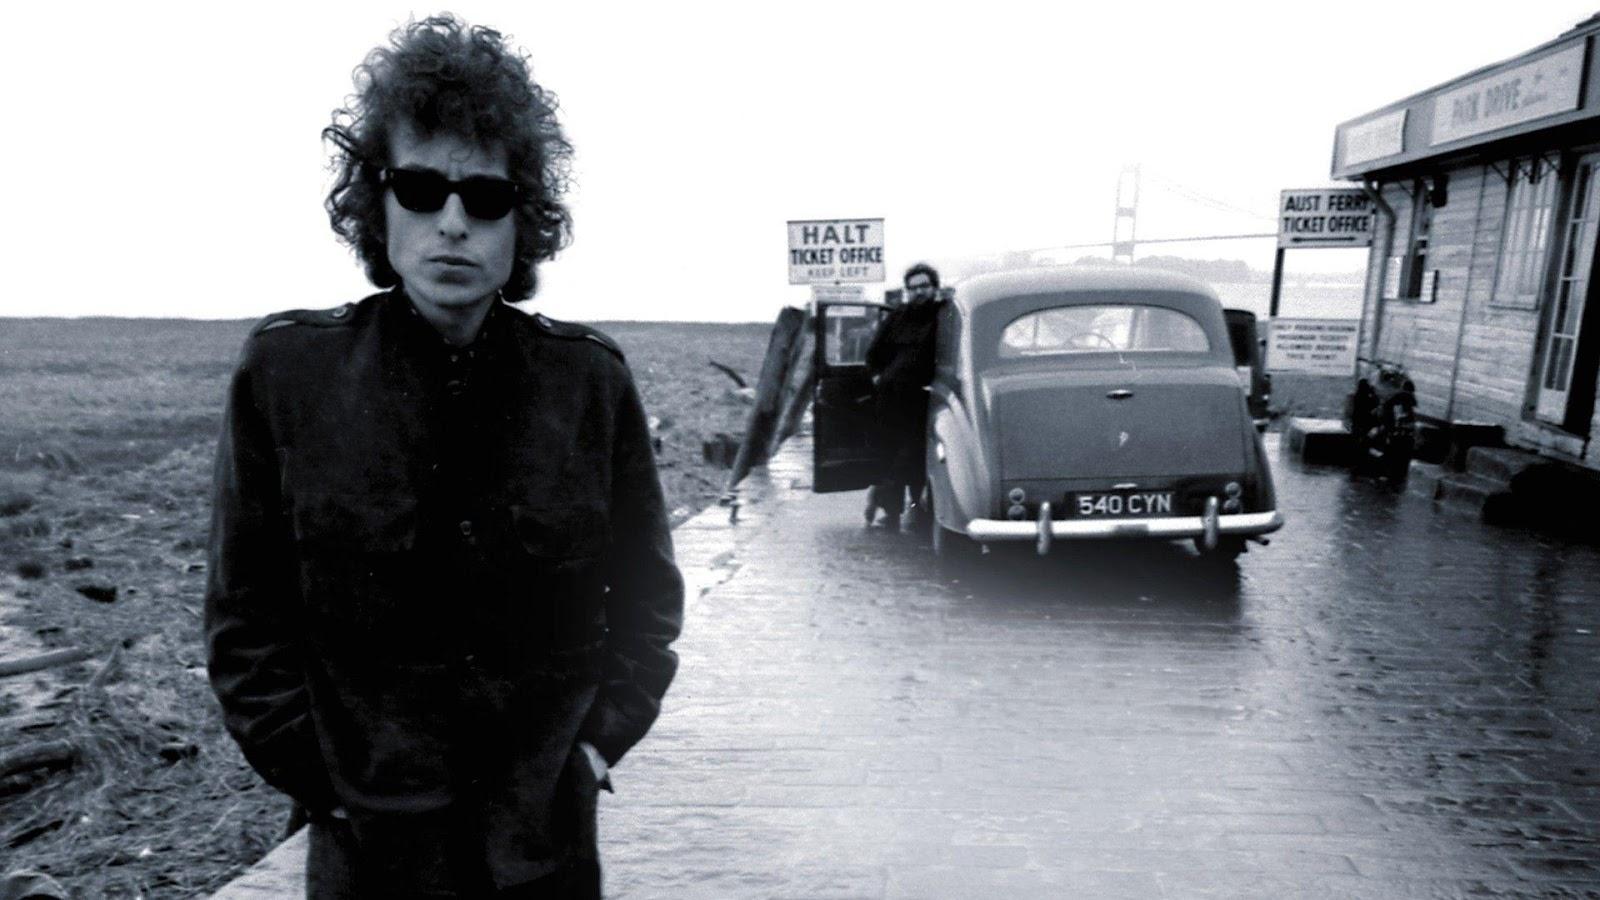 Bob Dylan Wallpapers - Top Free Bob Dylan Backgrounds - WallpaperAccess